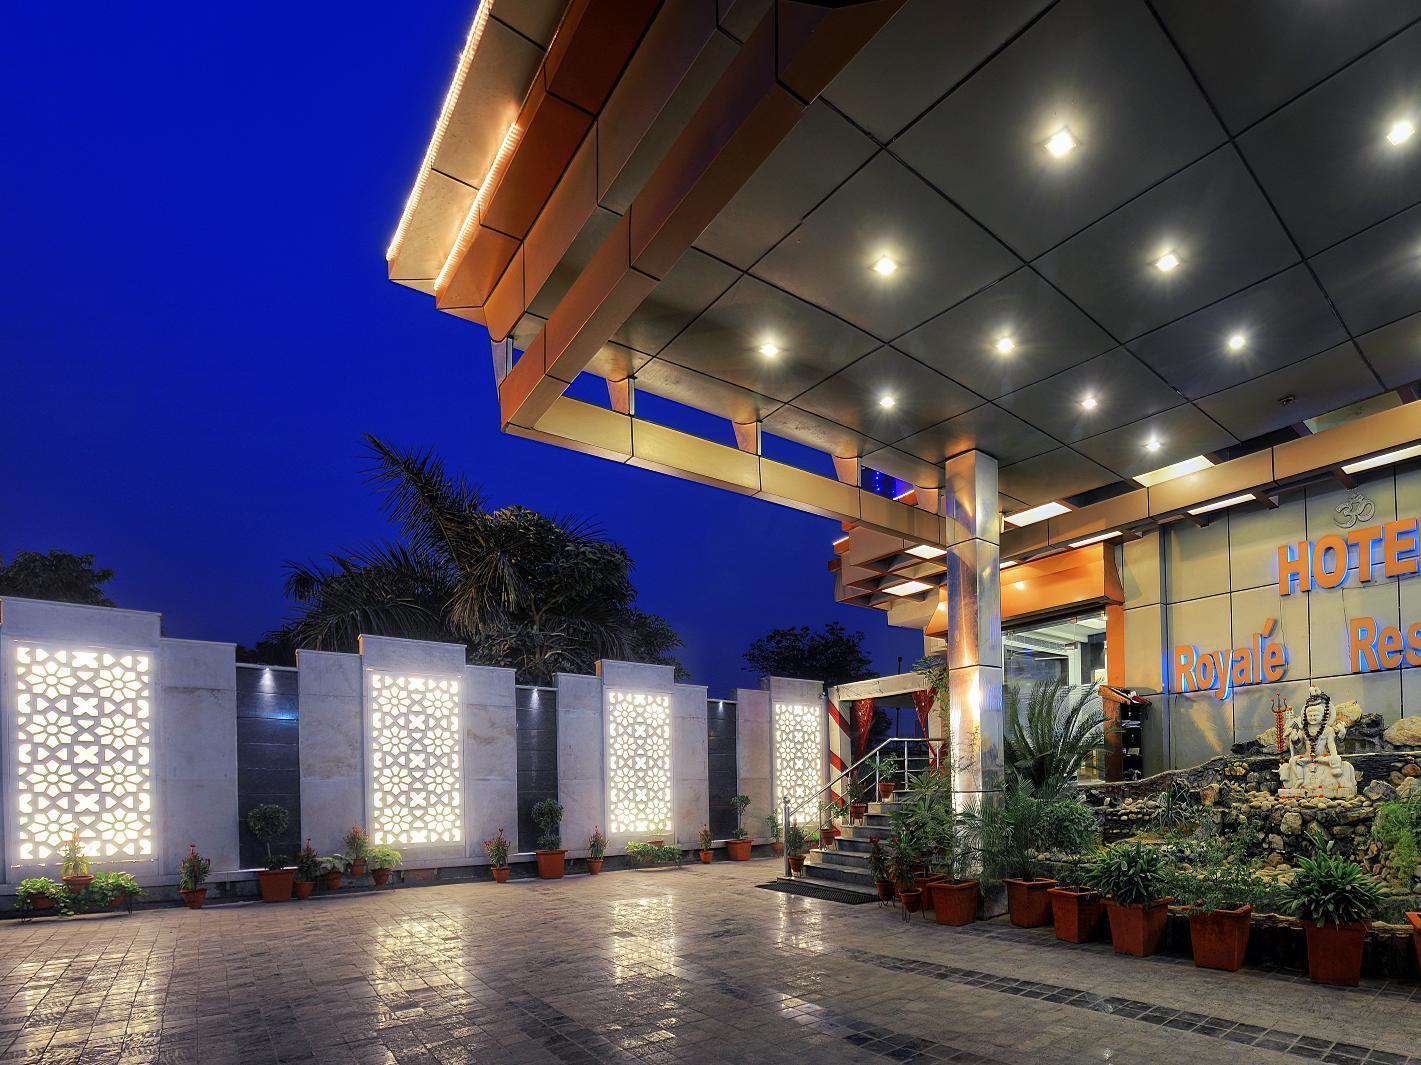 Royale Residency Hotel - Agra